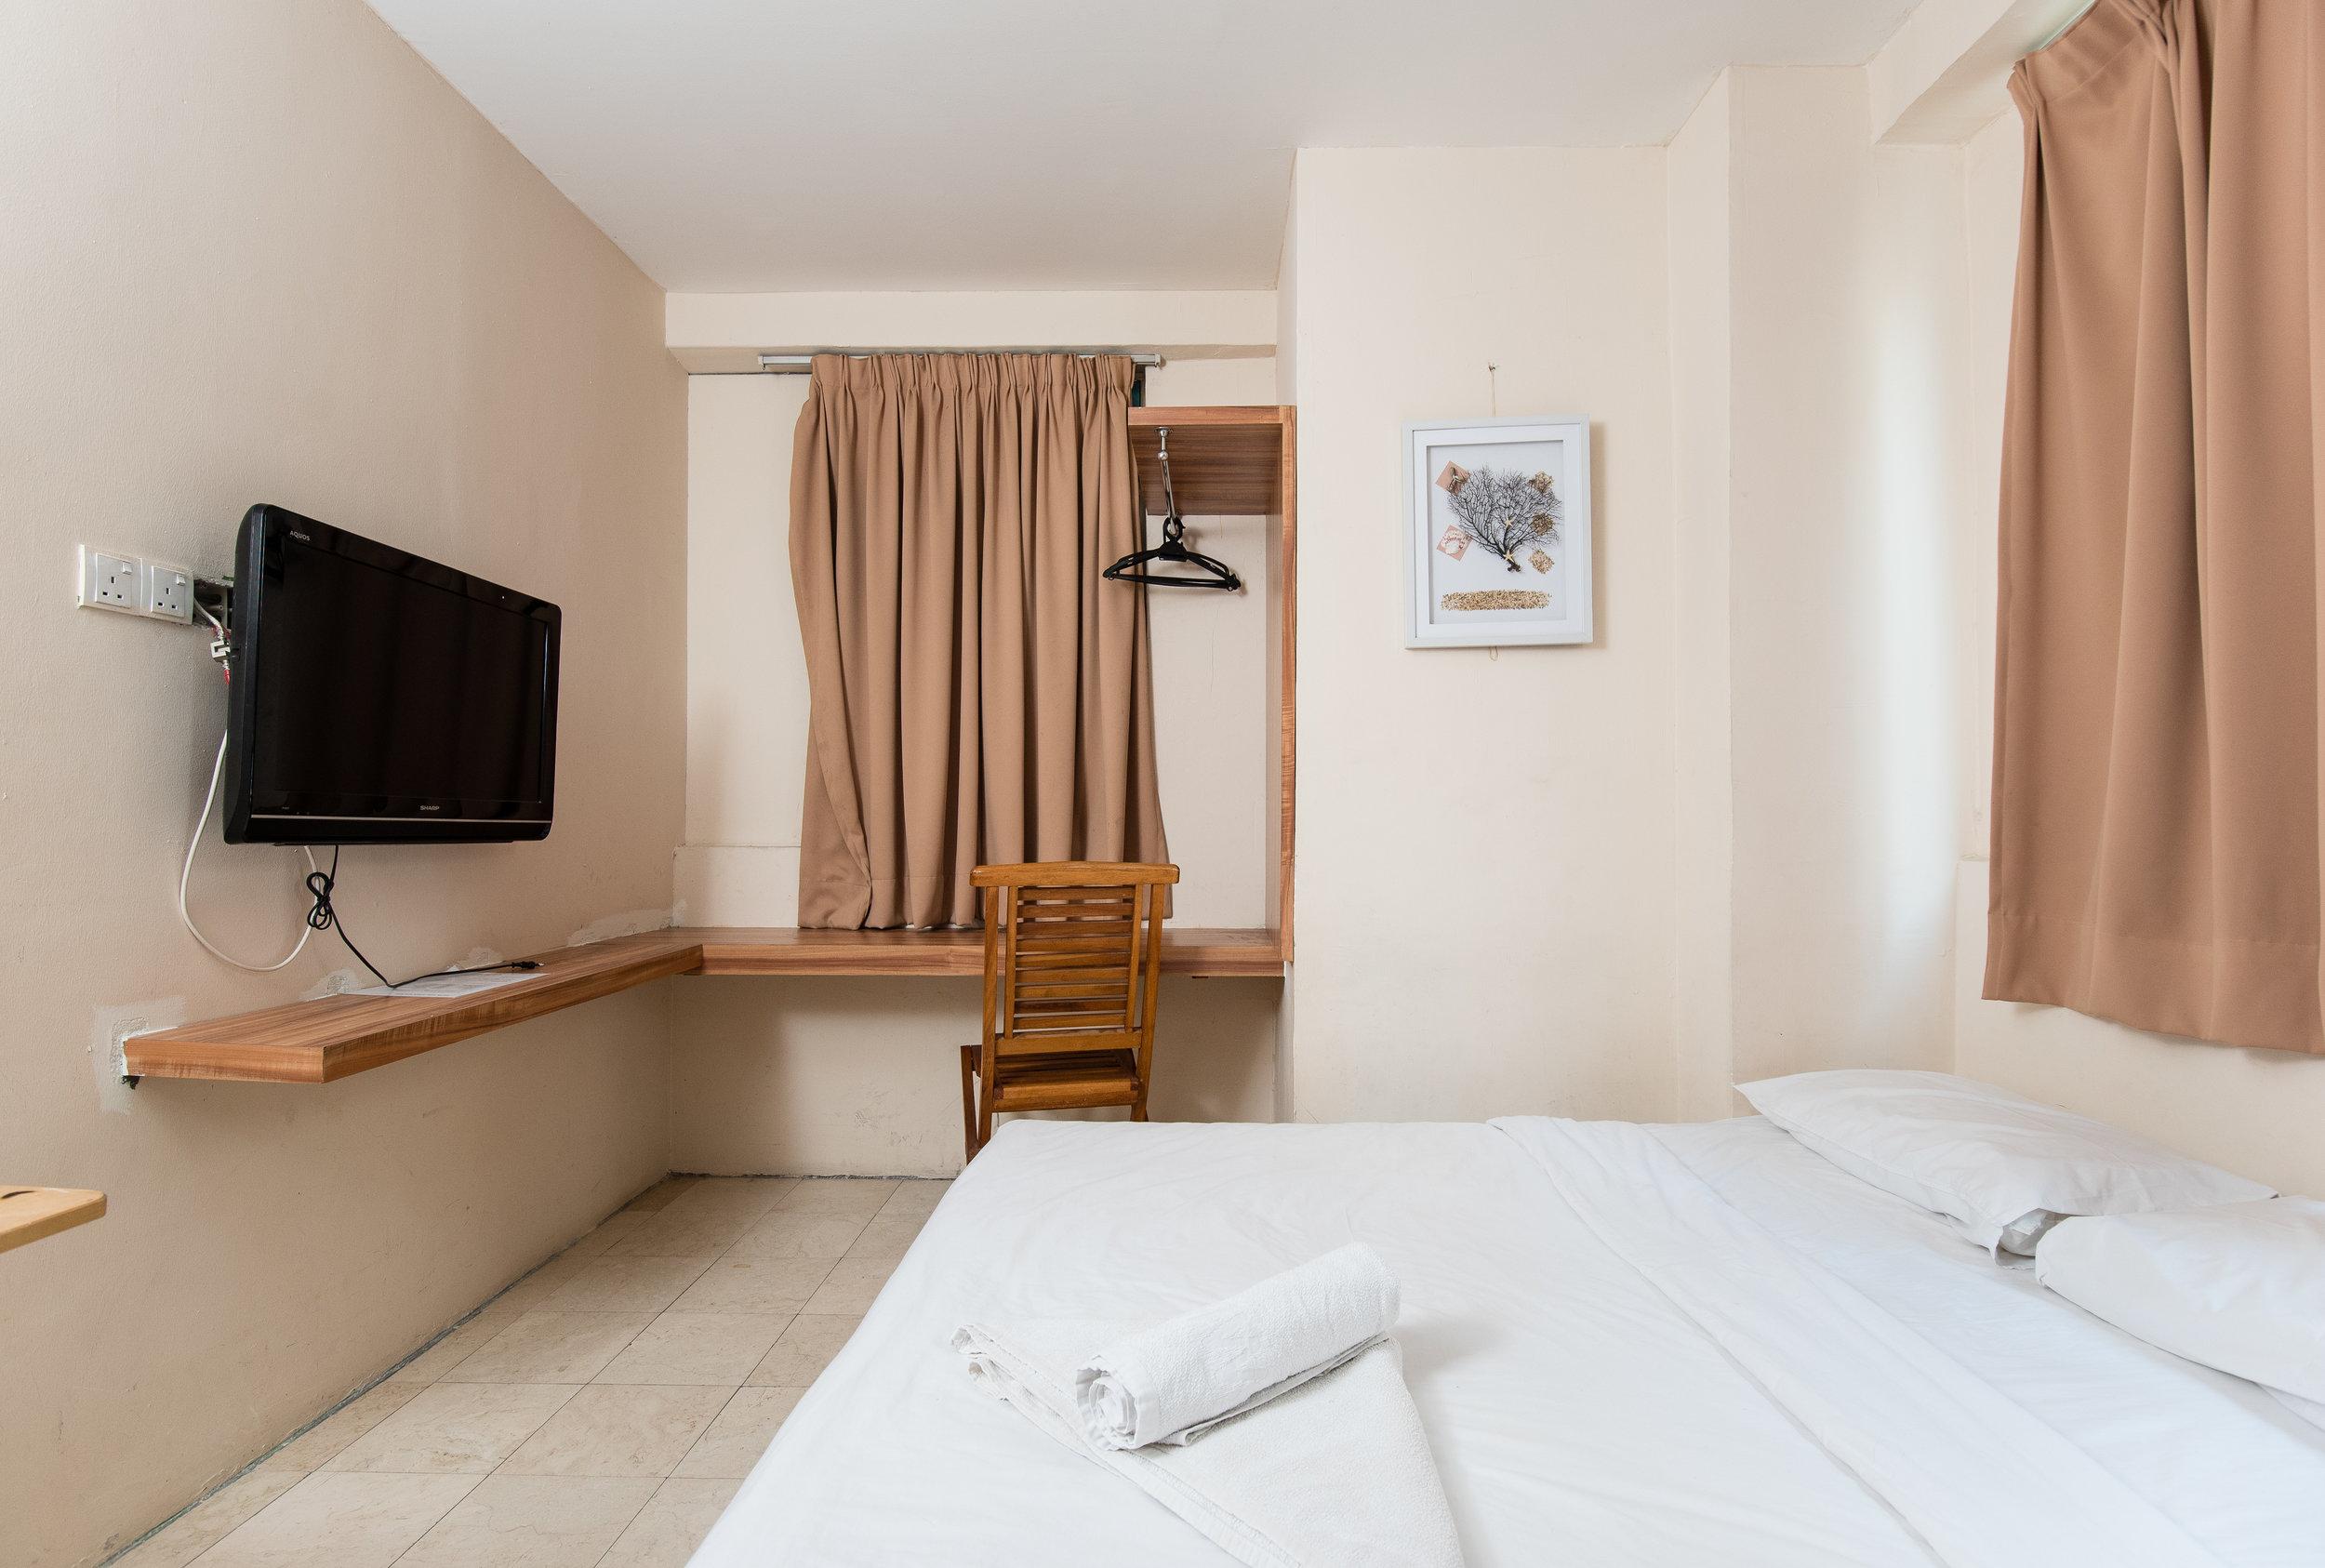 New_Town_Hotel-1035.jpg